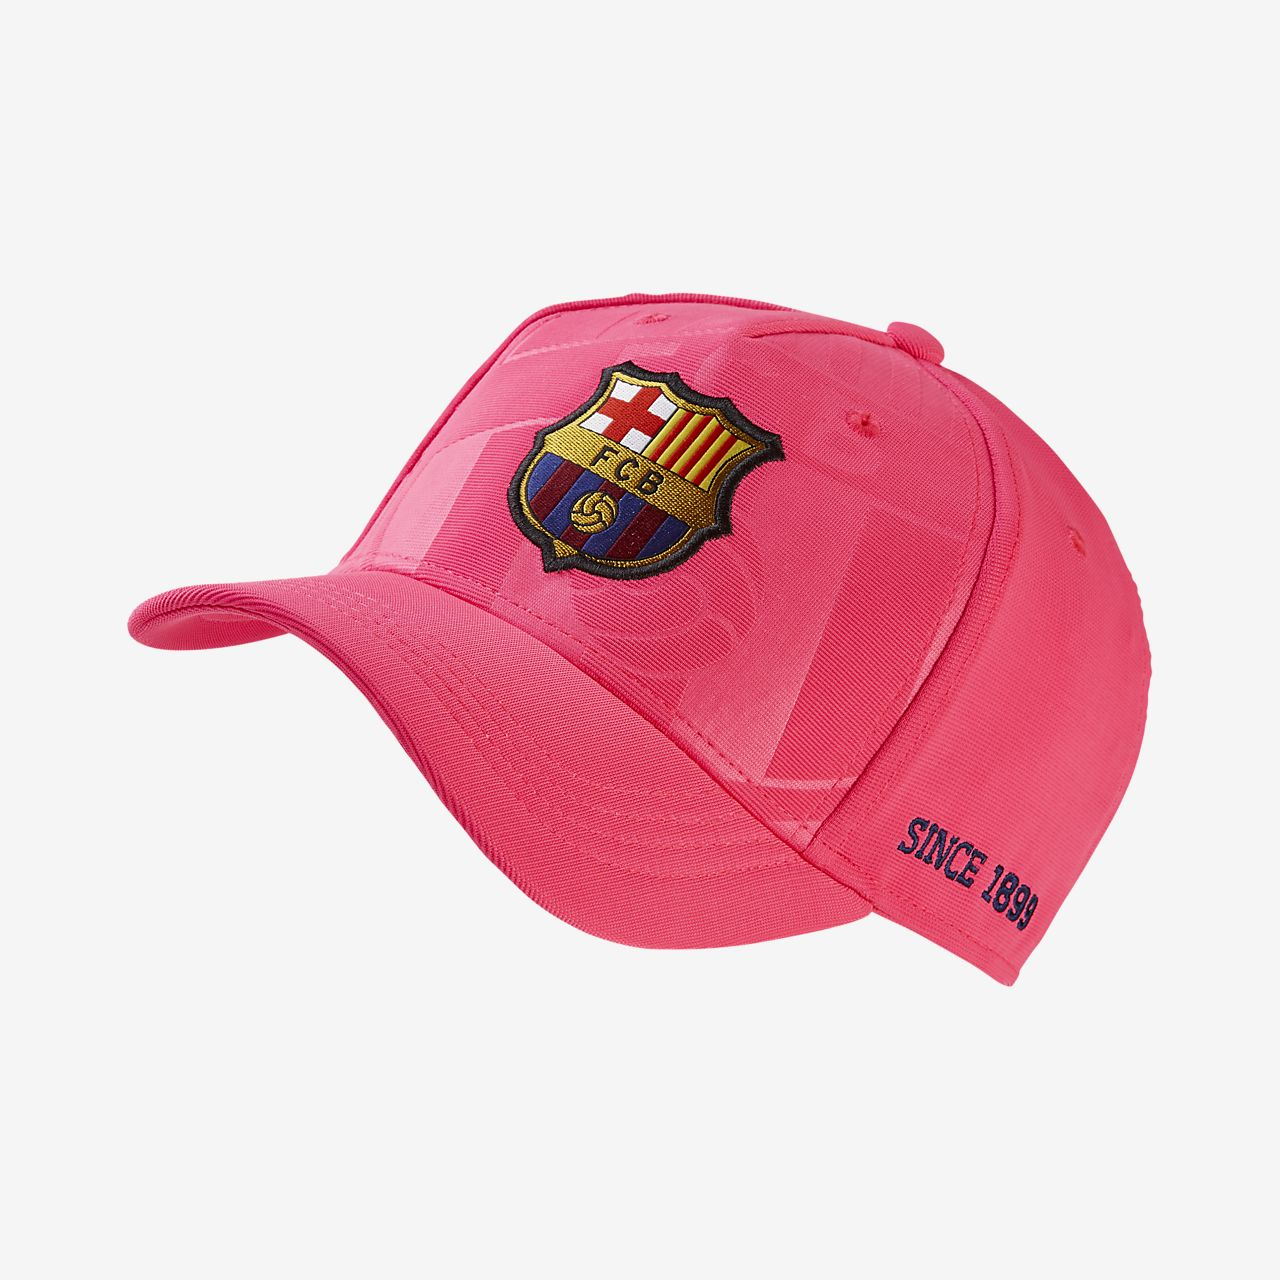 2b819445fb86b8 FC Barcelona Adjustable Hat. Nike.com GB